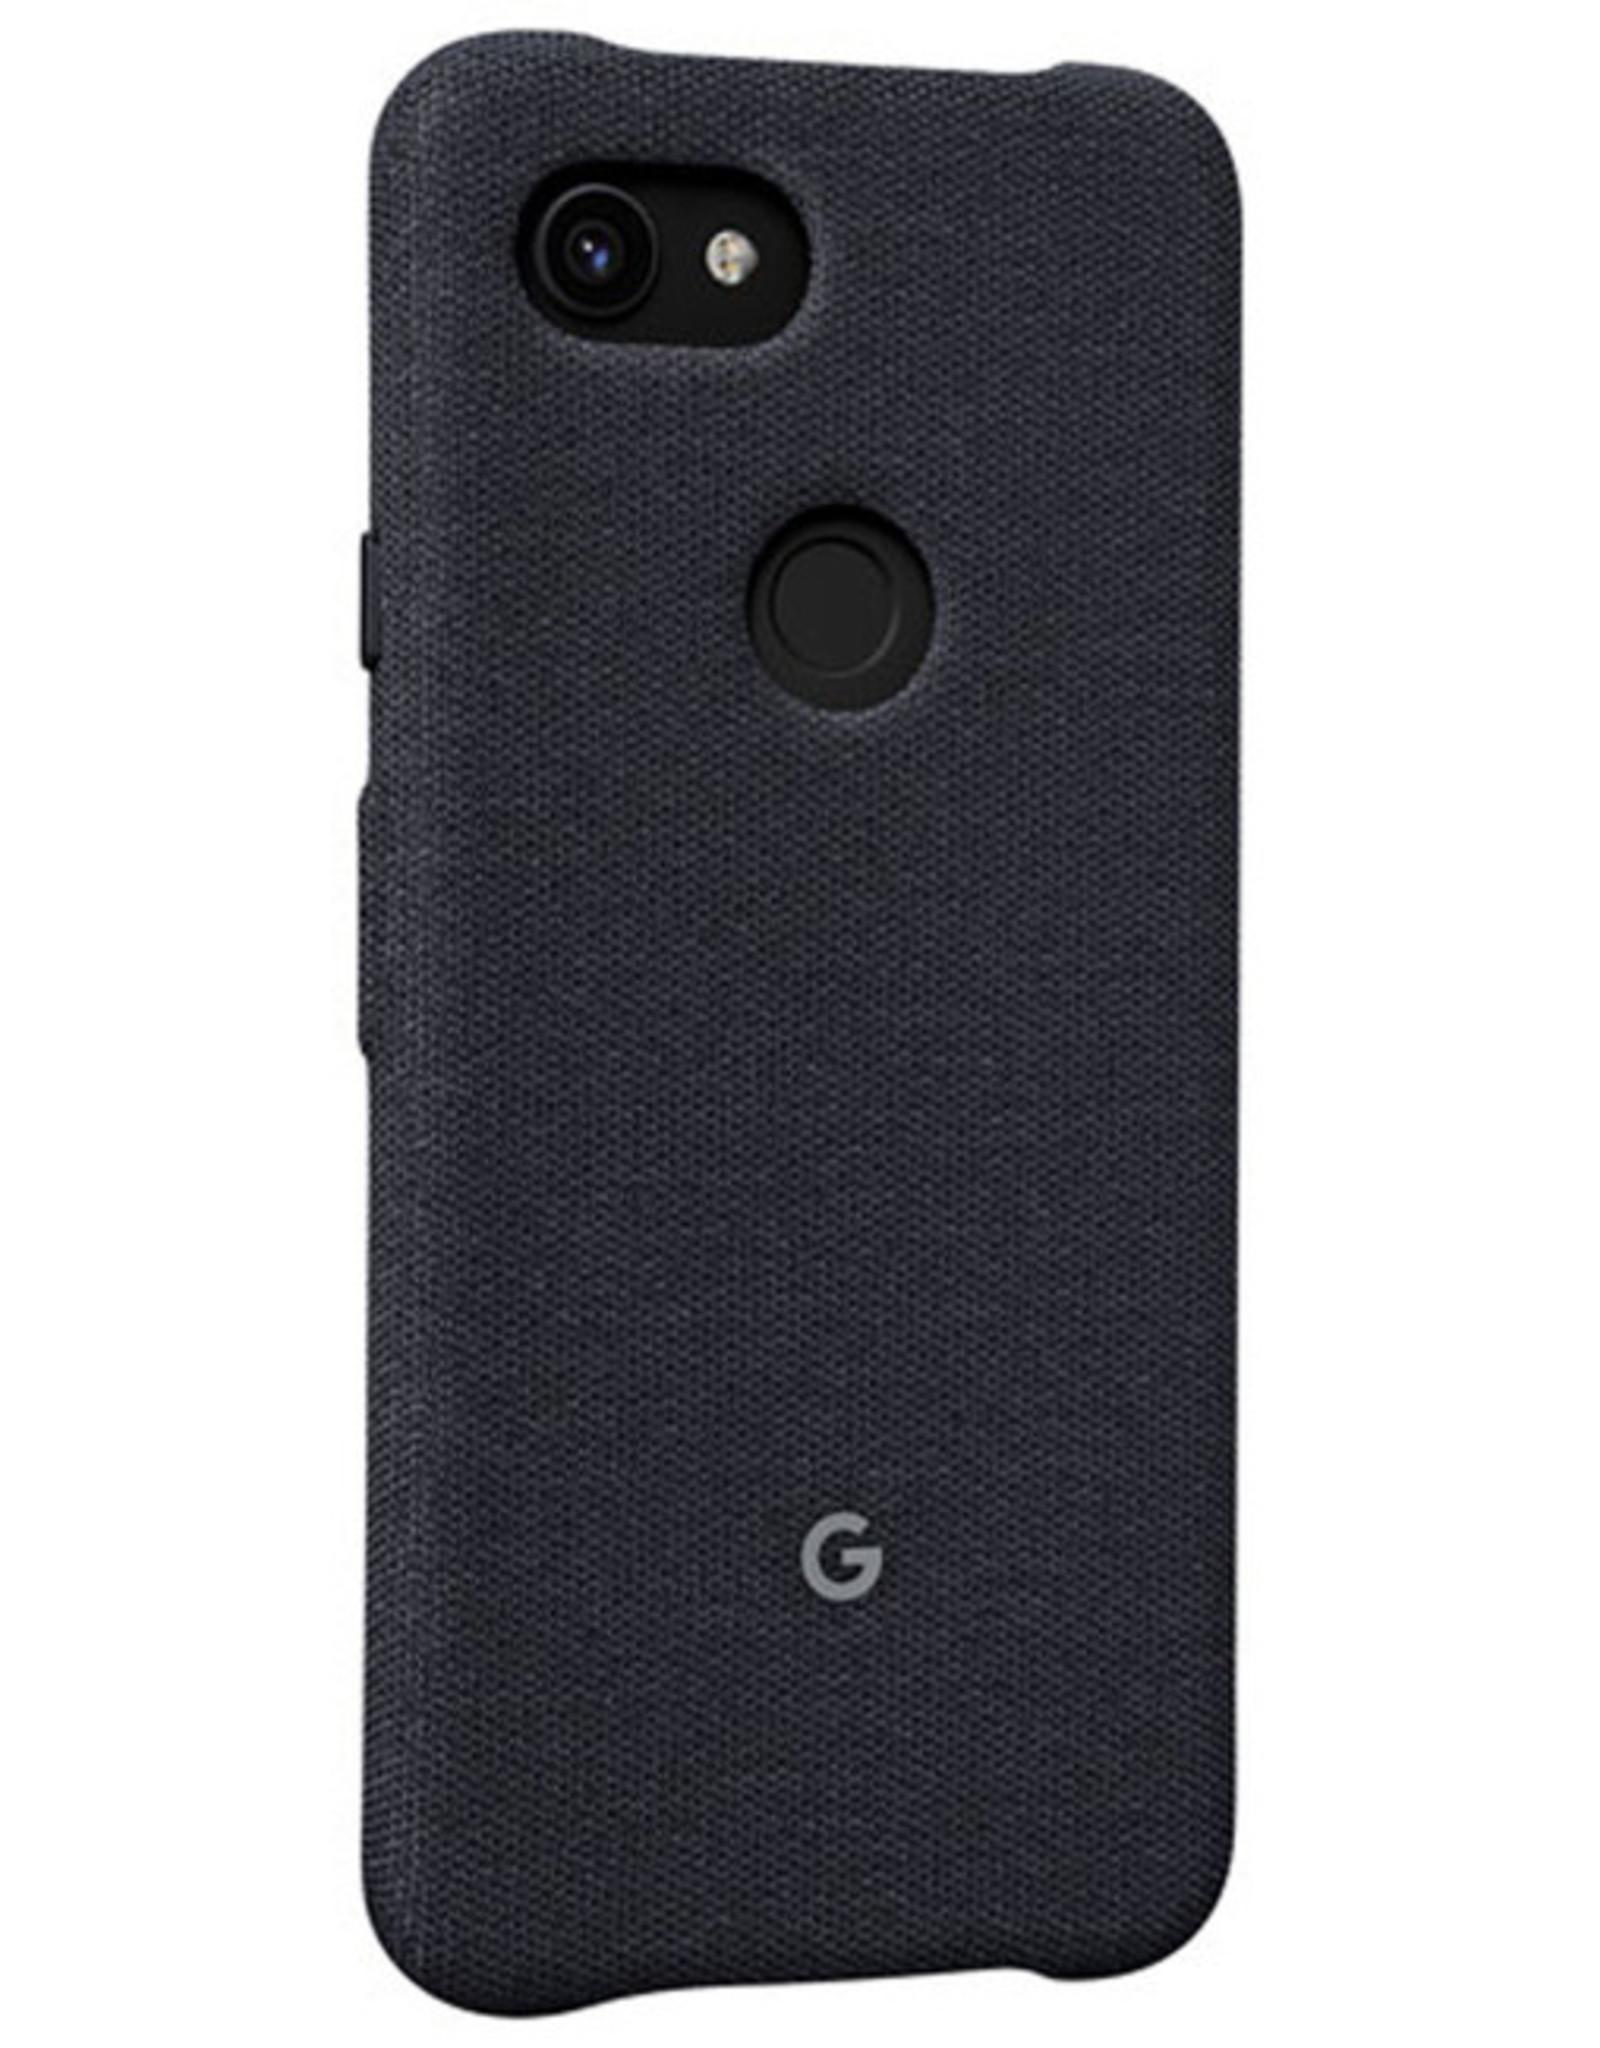 Google SO Google - Fabric Case Carbon (Black) for Google Pixel 3a 120-2453